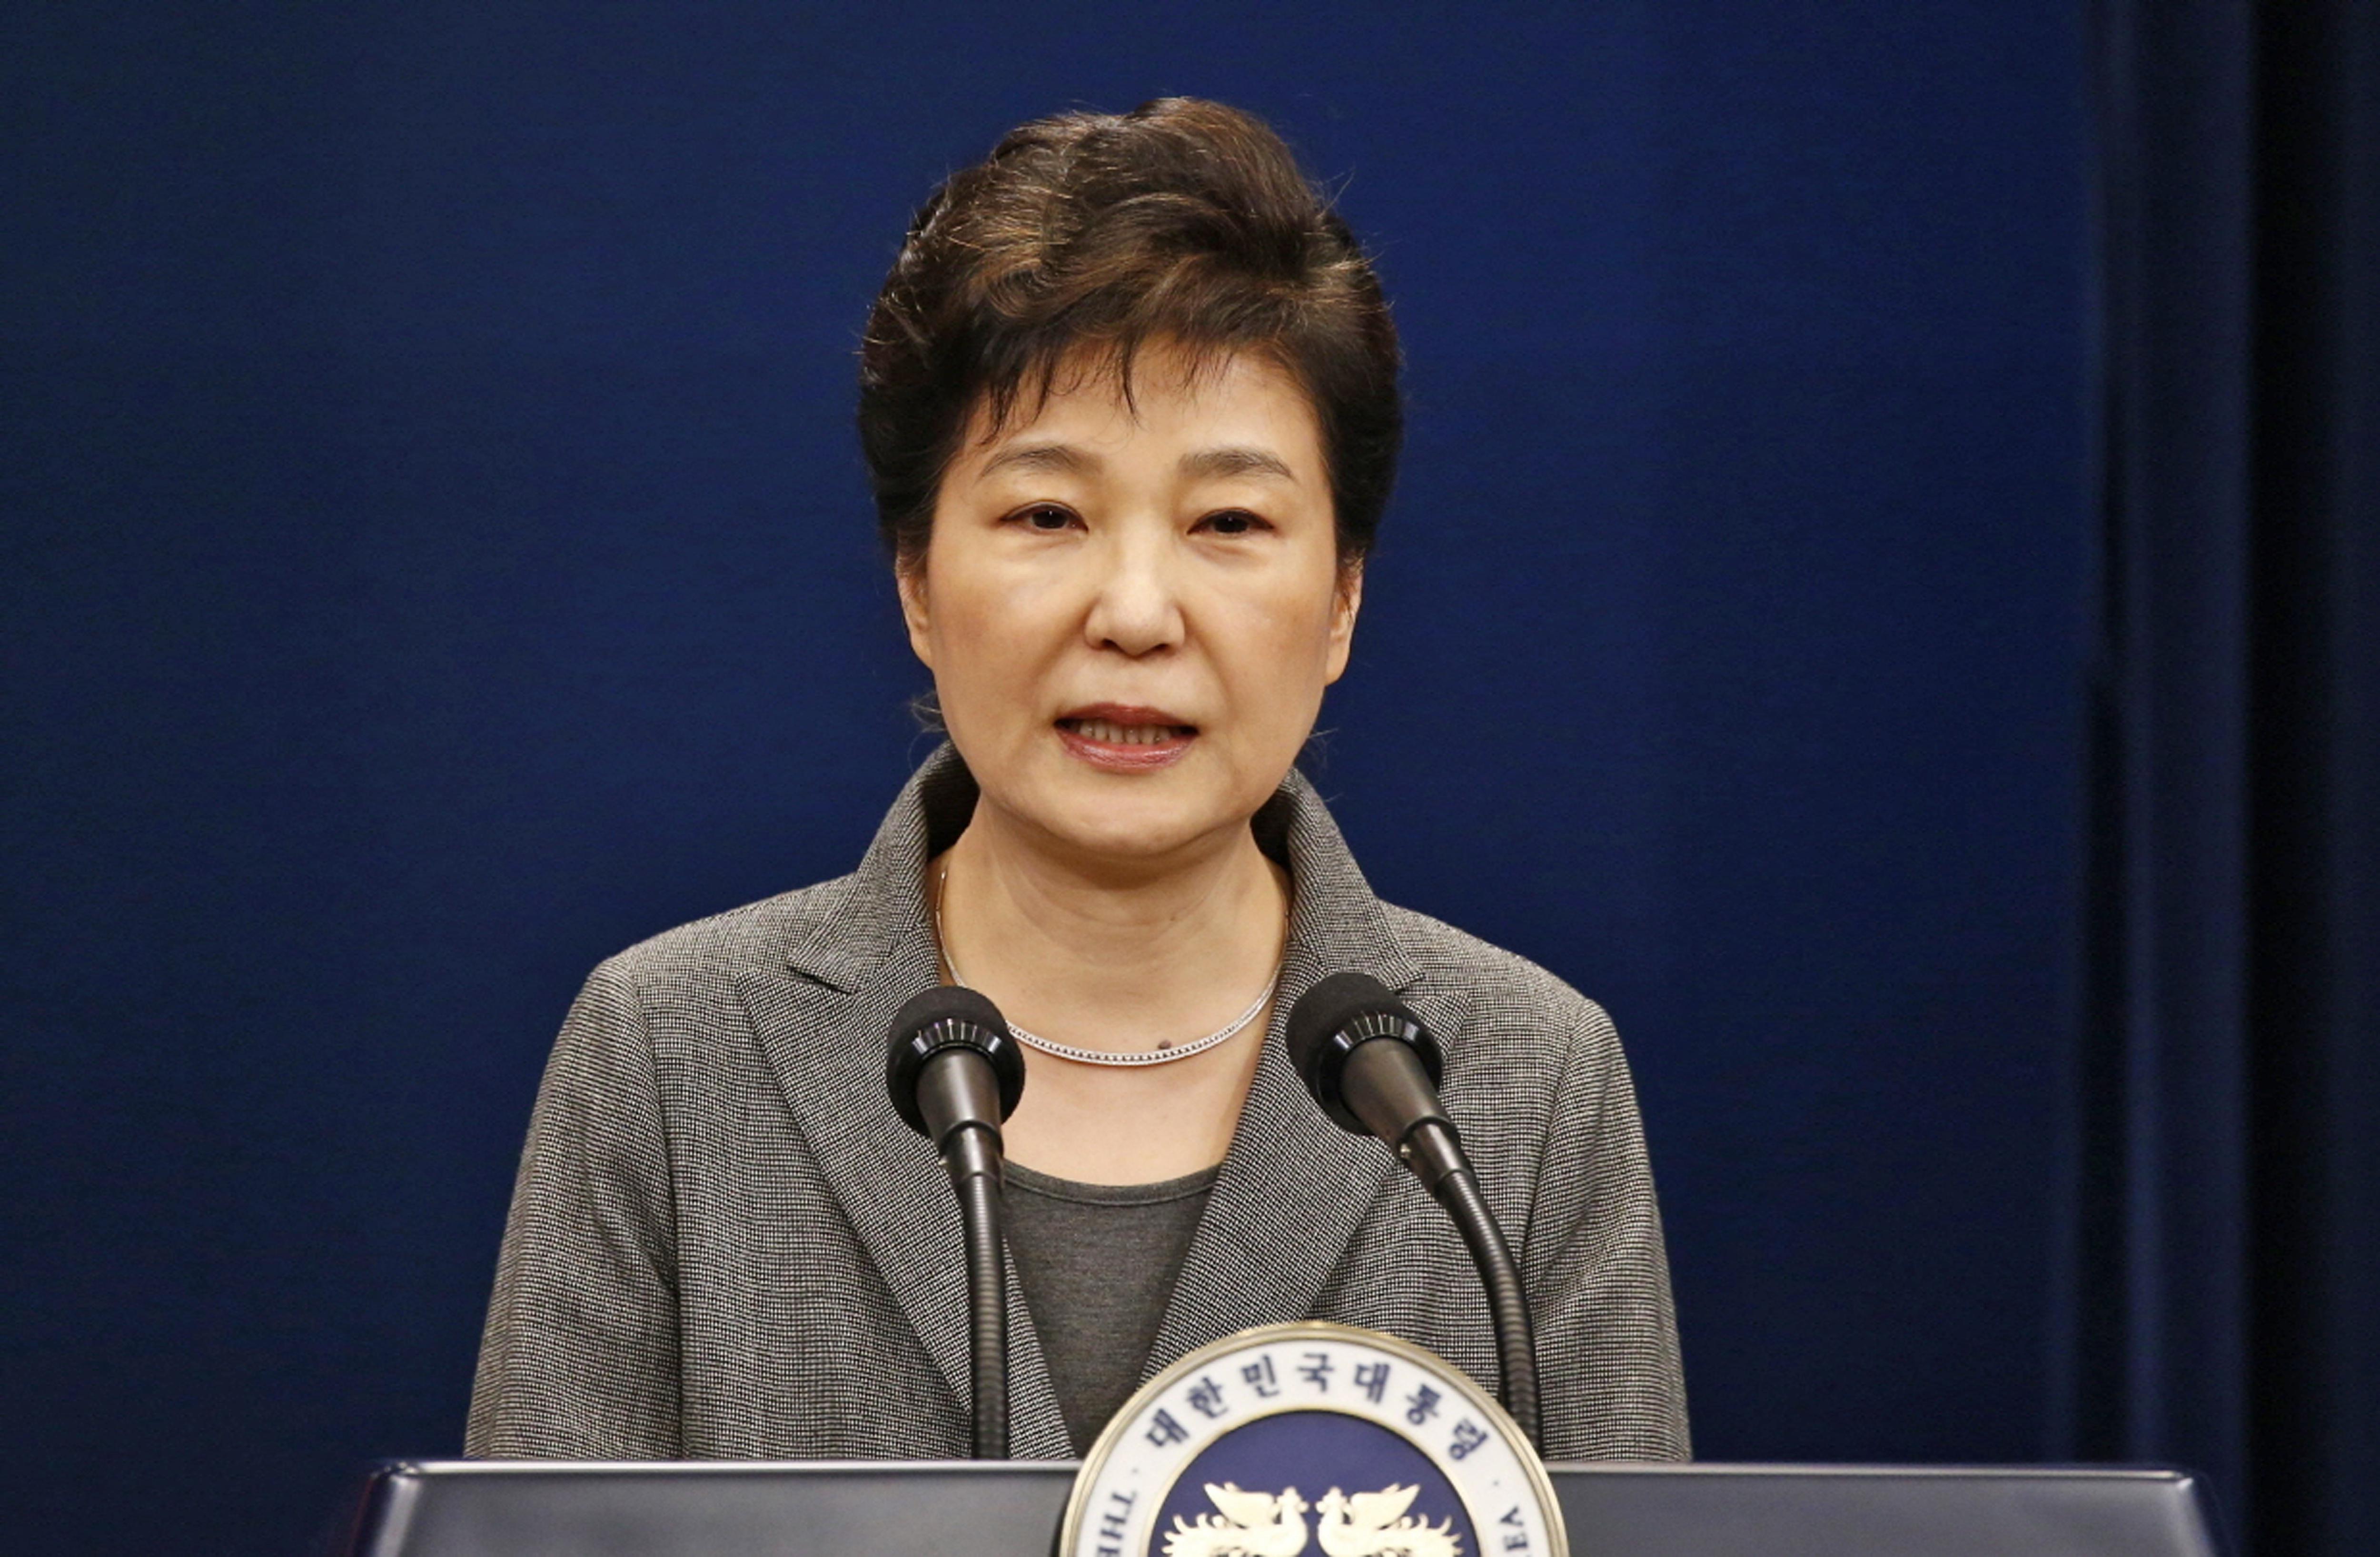 South Korean President Park Geun-hye makes a live televised address in Seoul, South Korea on Nov. 29, 2016. (Pool Photo via AP)